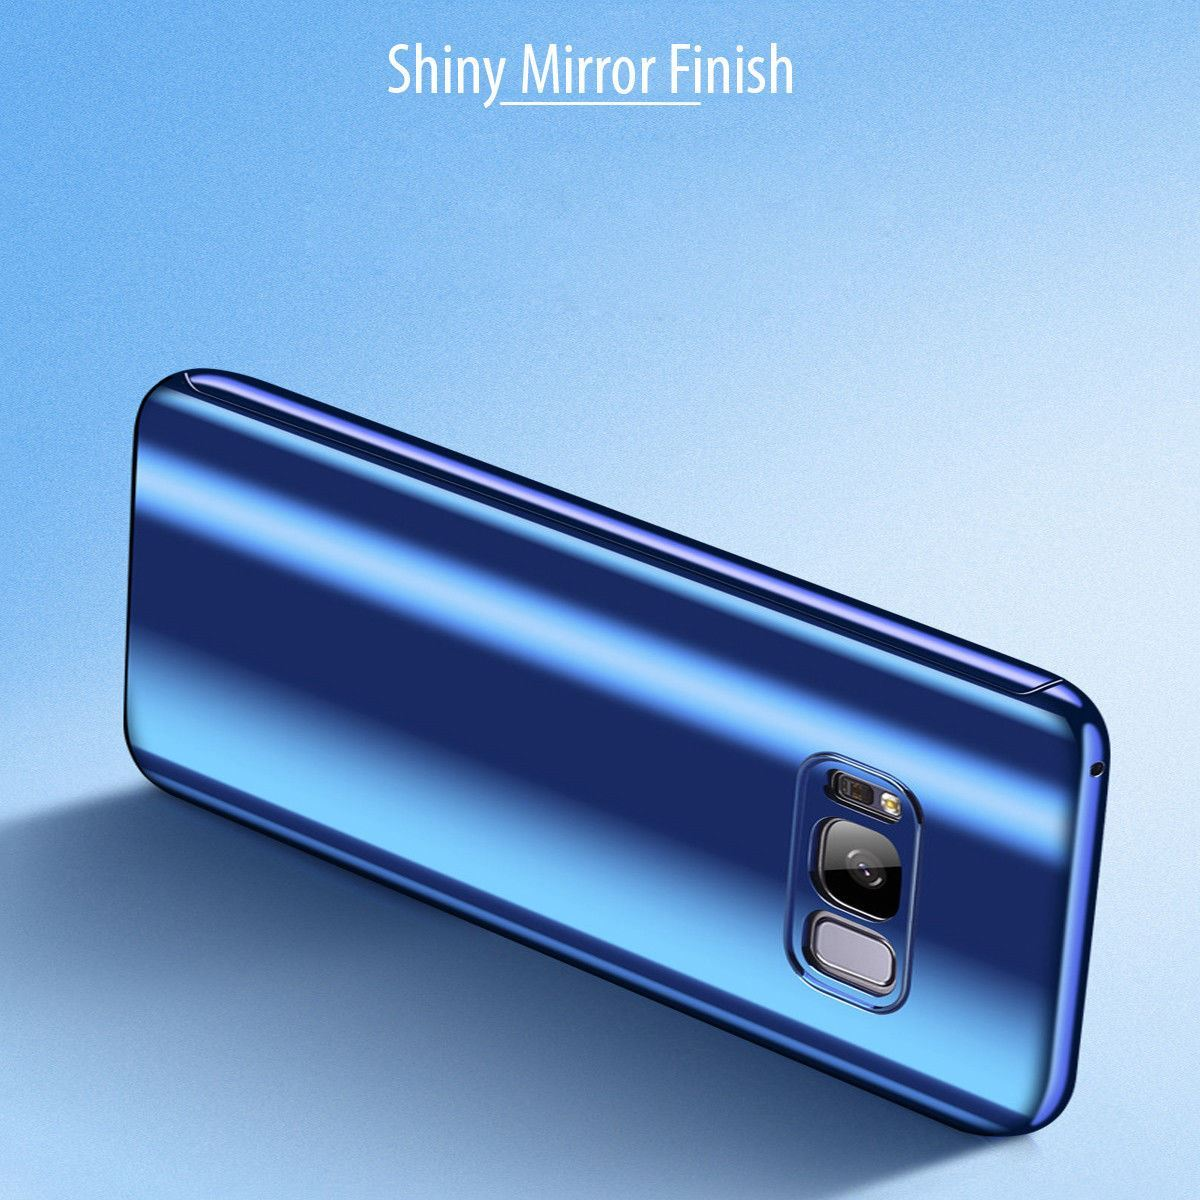 Shockproof-Hybrid-360-Ultra-Thin-Mirror-Hard-Case-Samsung-Galaxy-S7-edge-S8-S9 thumbnail 46